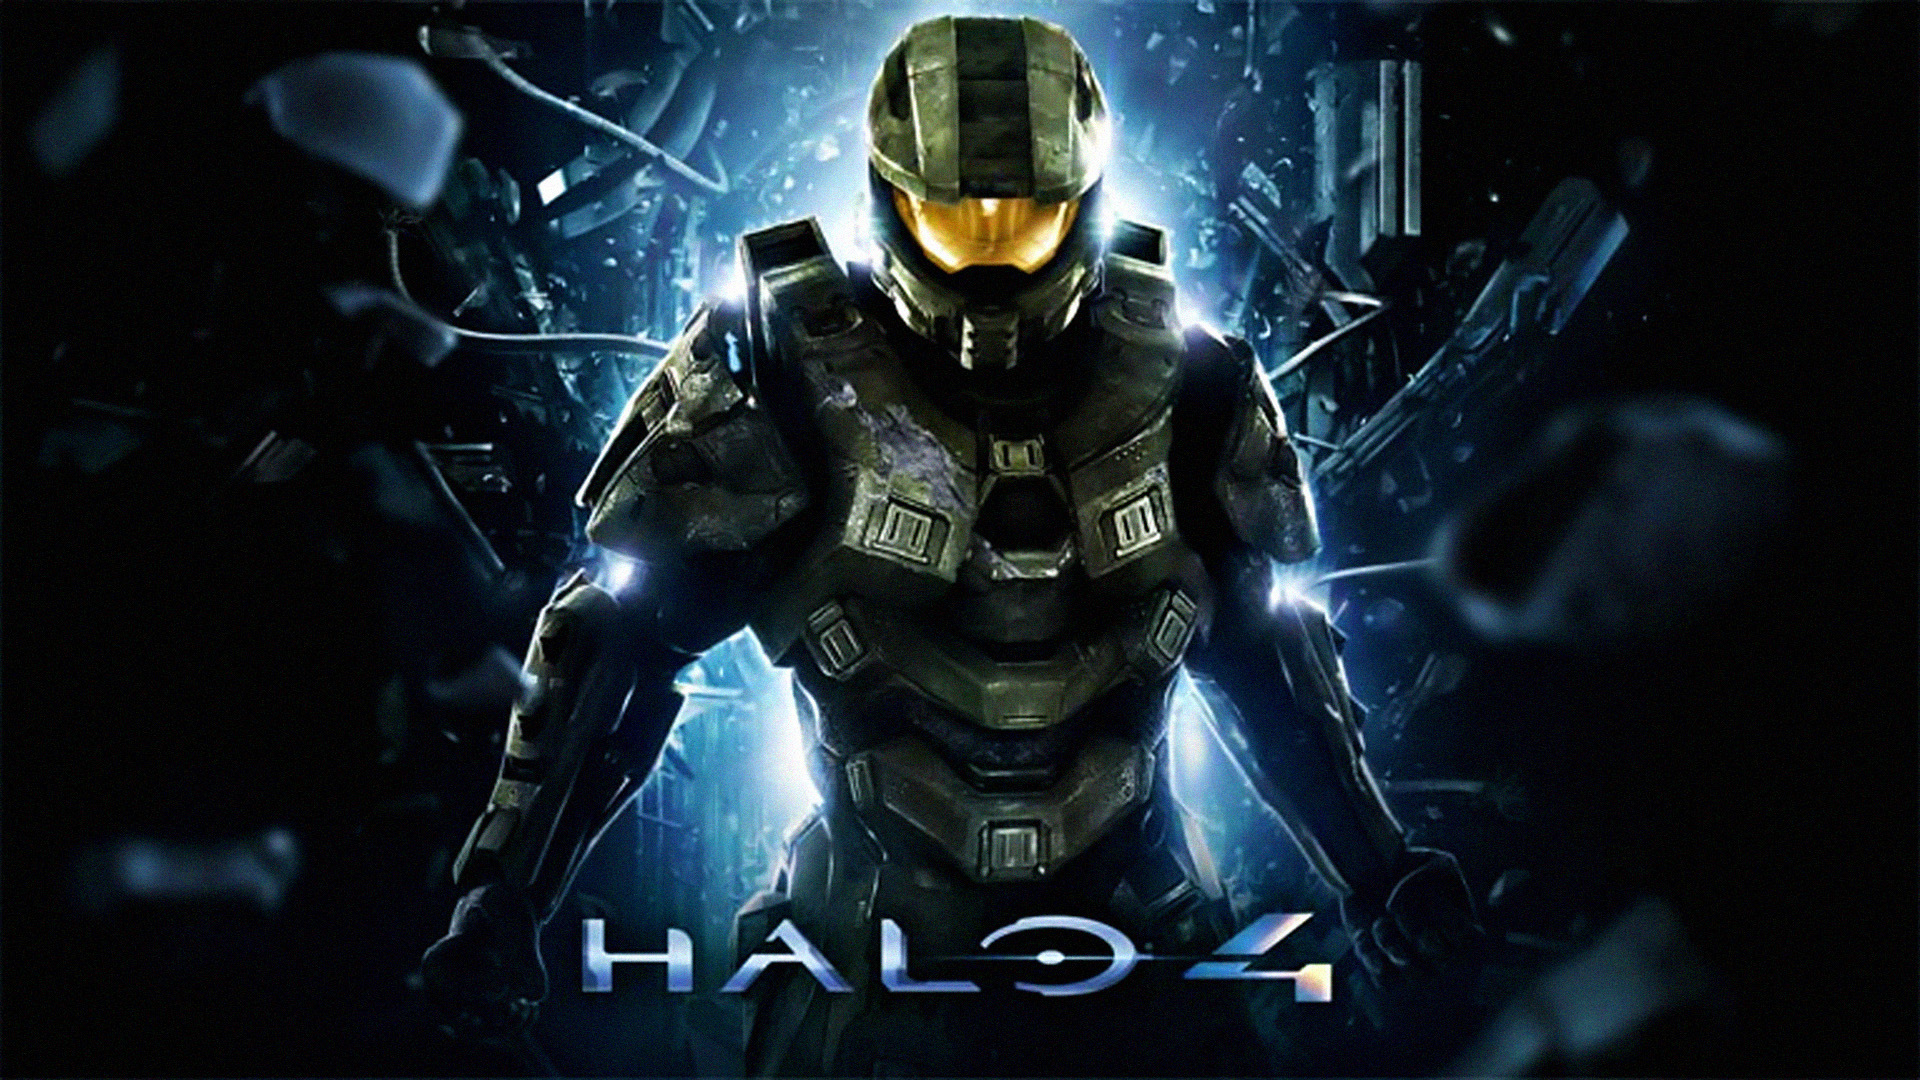 Halo 4 Wallpaper HD Download 1920x1080